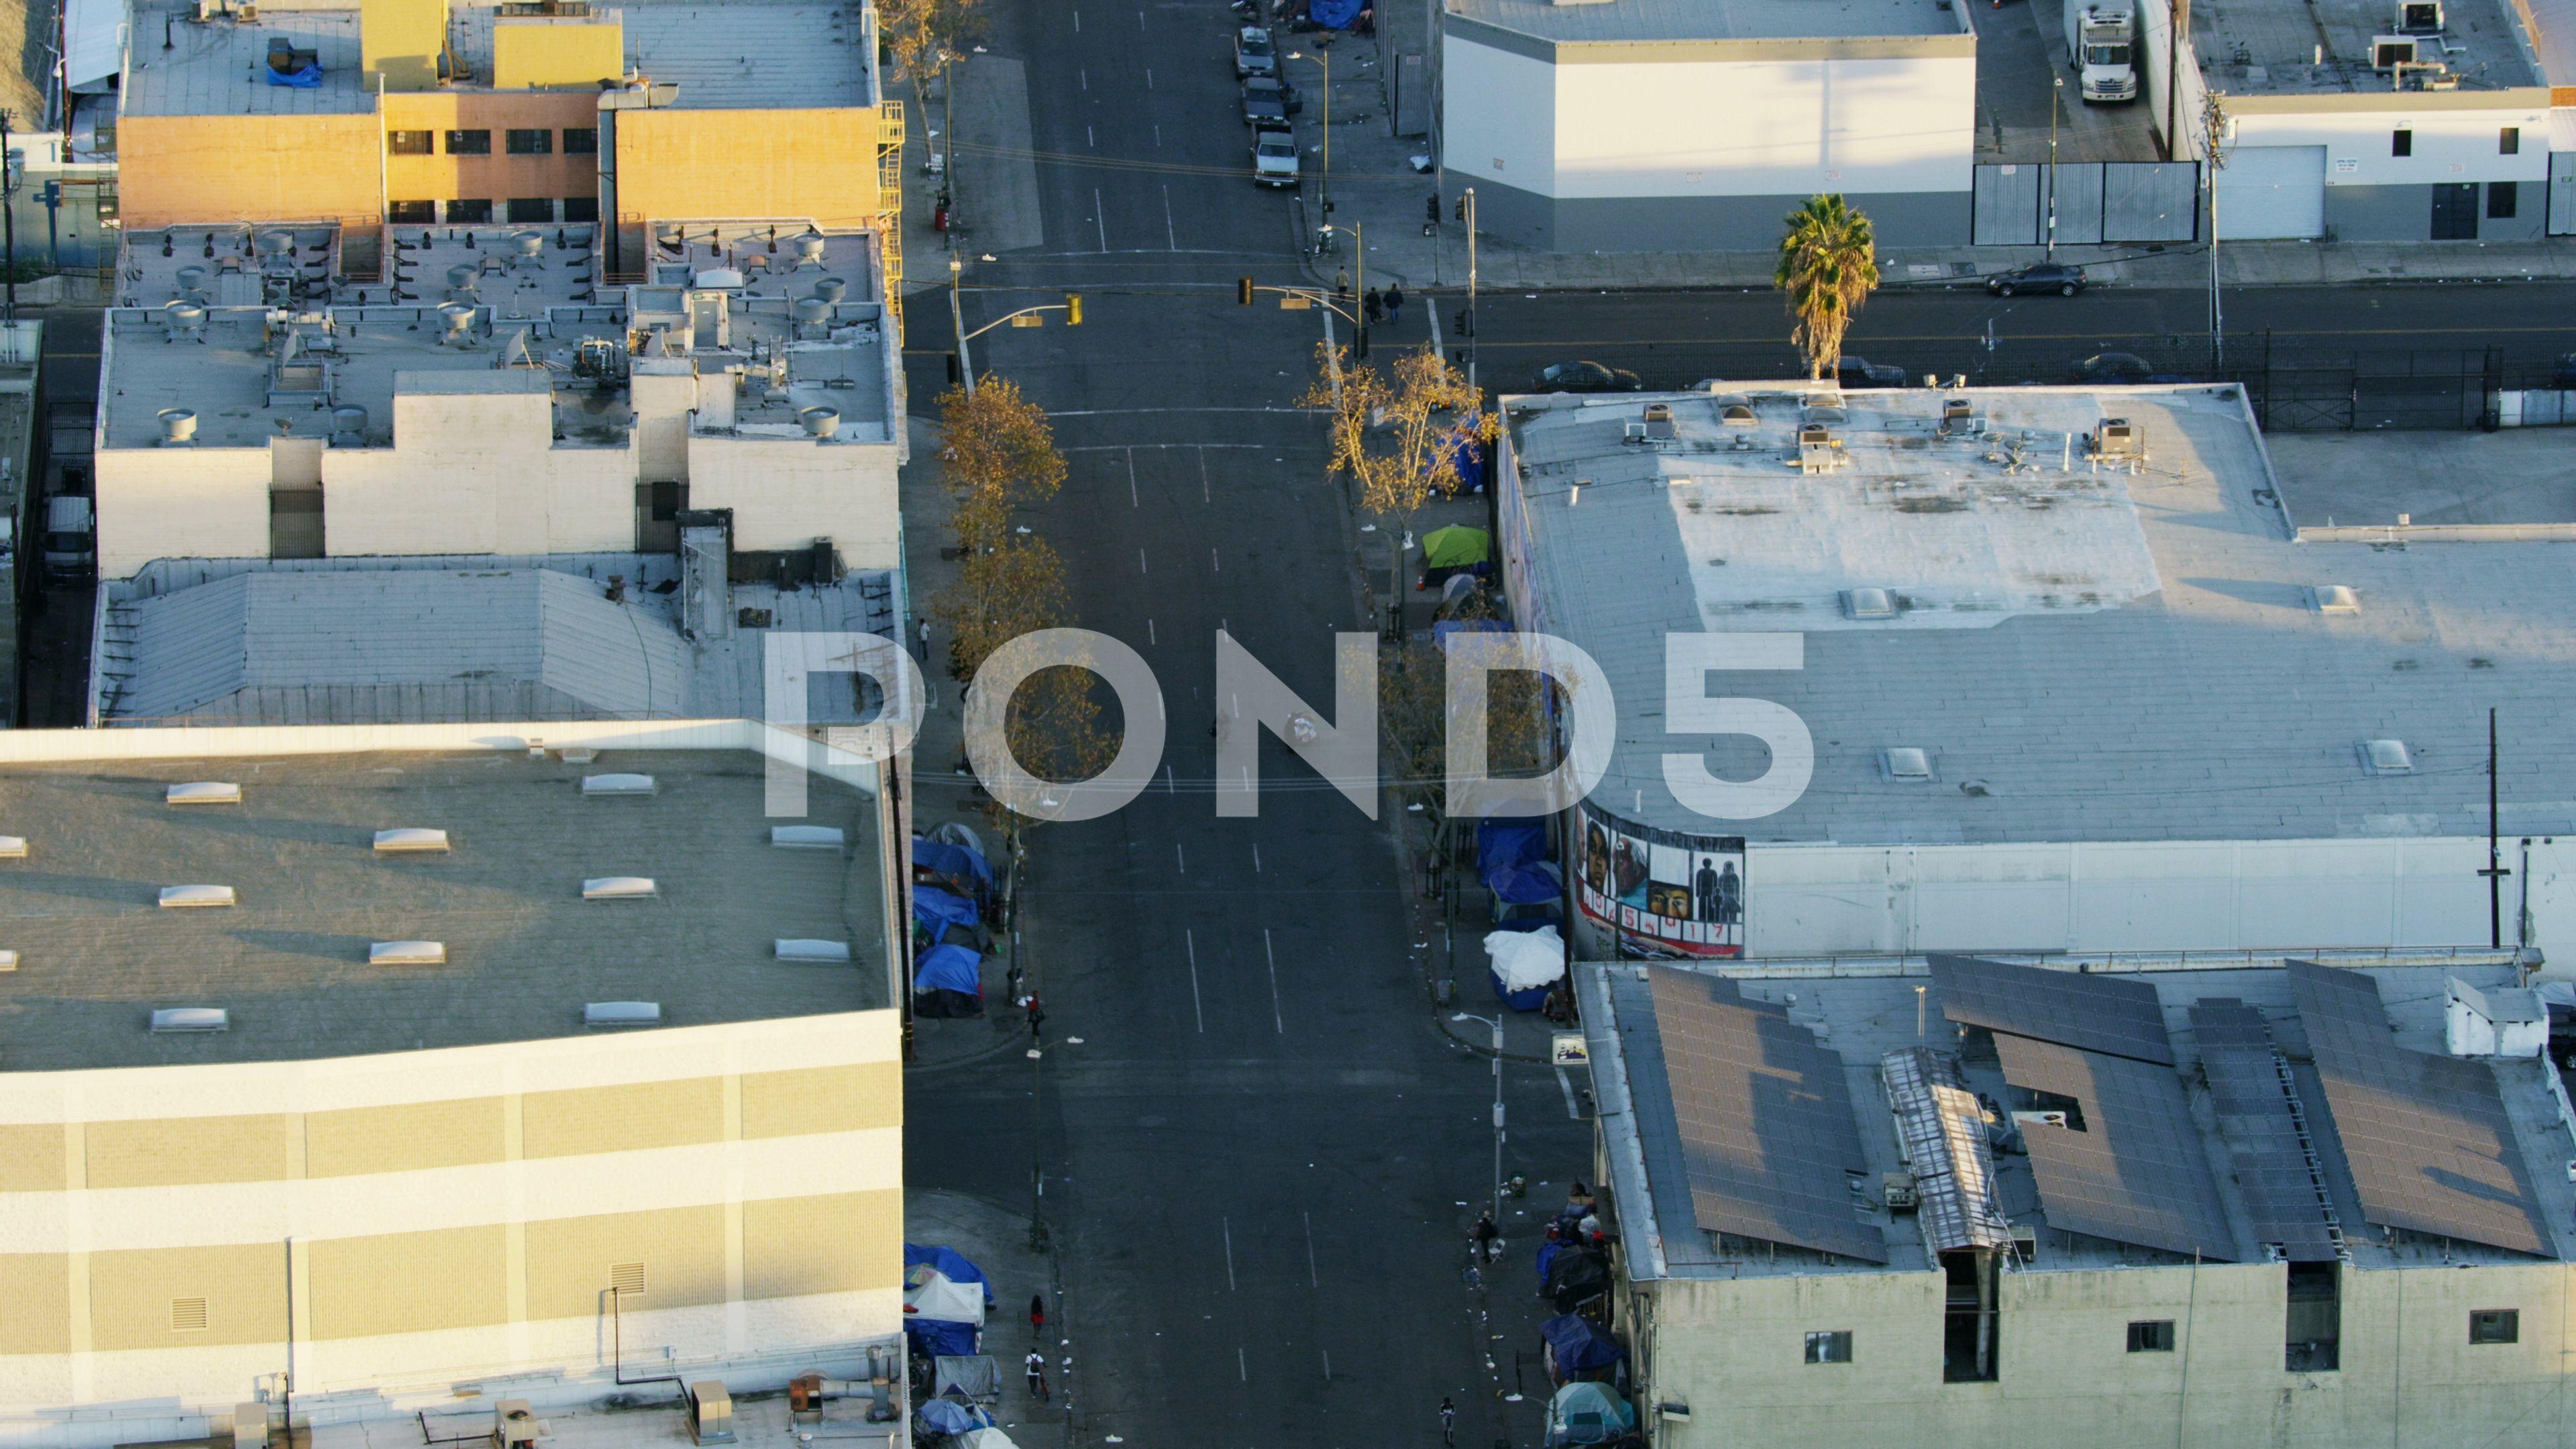 Aerial Skid Row Tent City Homeless People La Stock Footage Ad Tent City Row Aerial Skid Row City Aerial